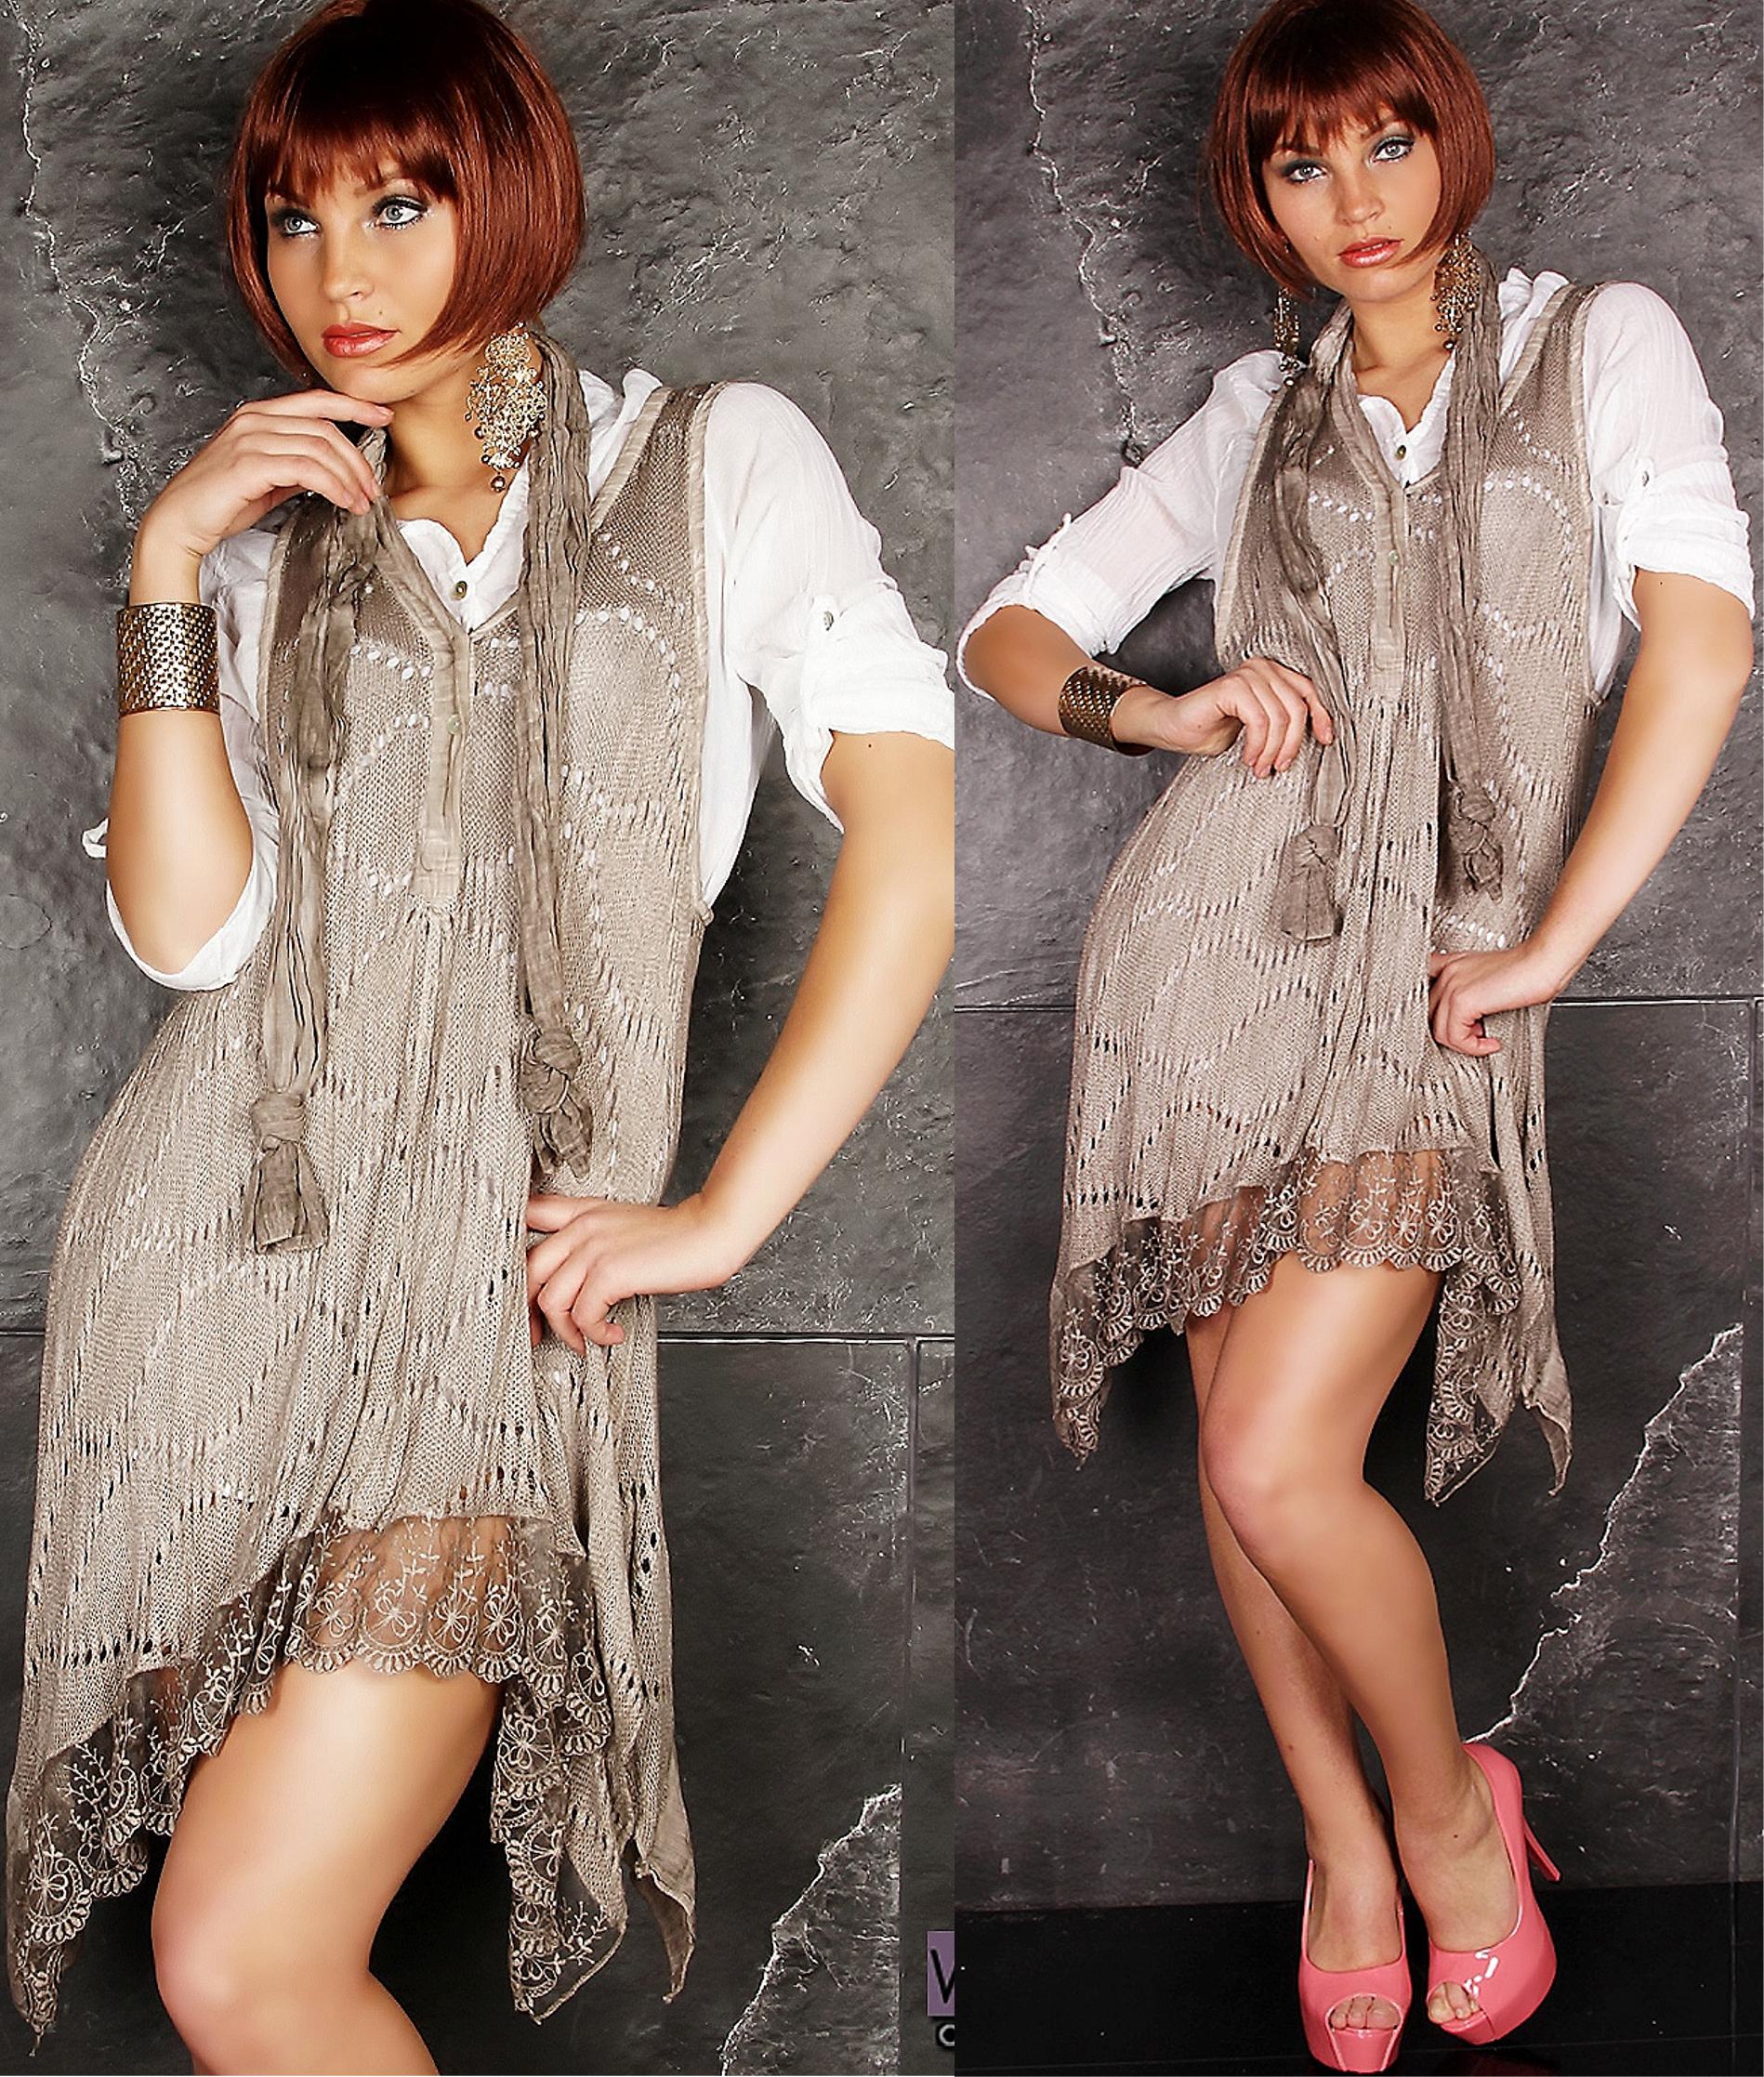 kleid minikleid spitze 3 tlg zipfel tunika weste vokuhila bluse schal beige s m ebay. Black Bedroom Furniture Sets. Home Design Ideas